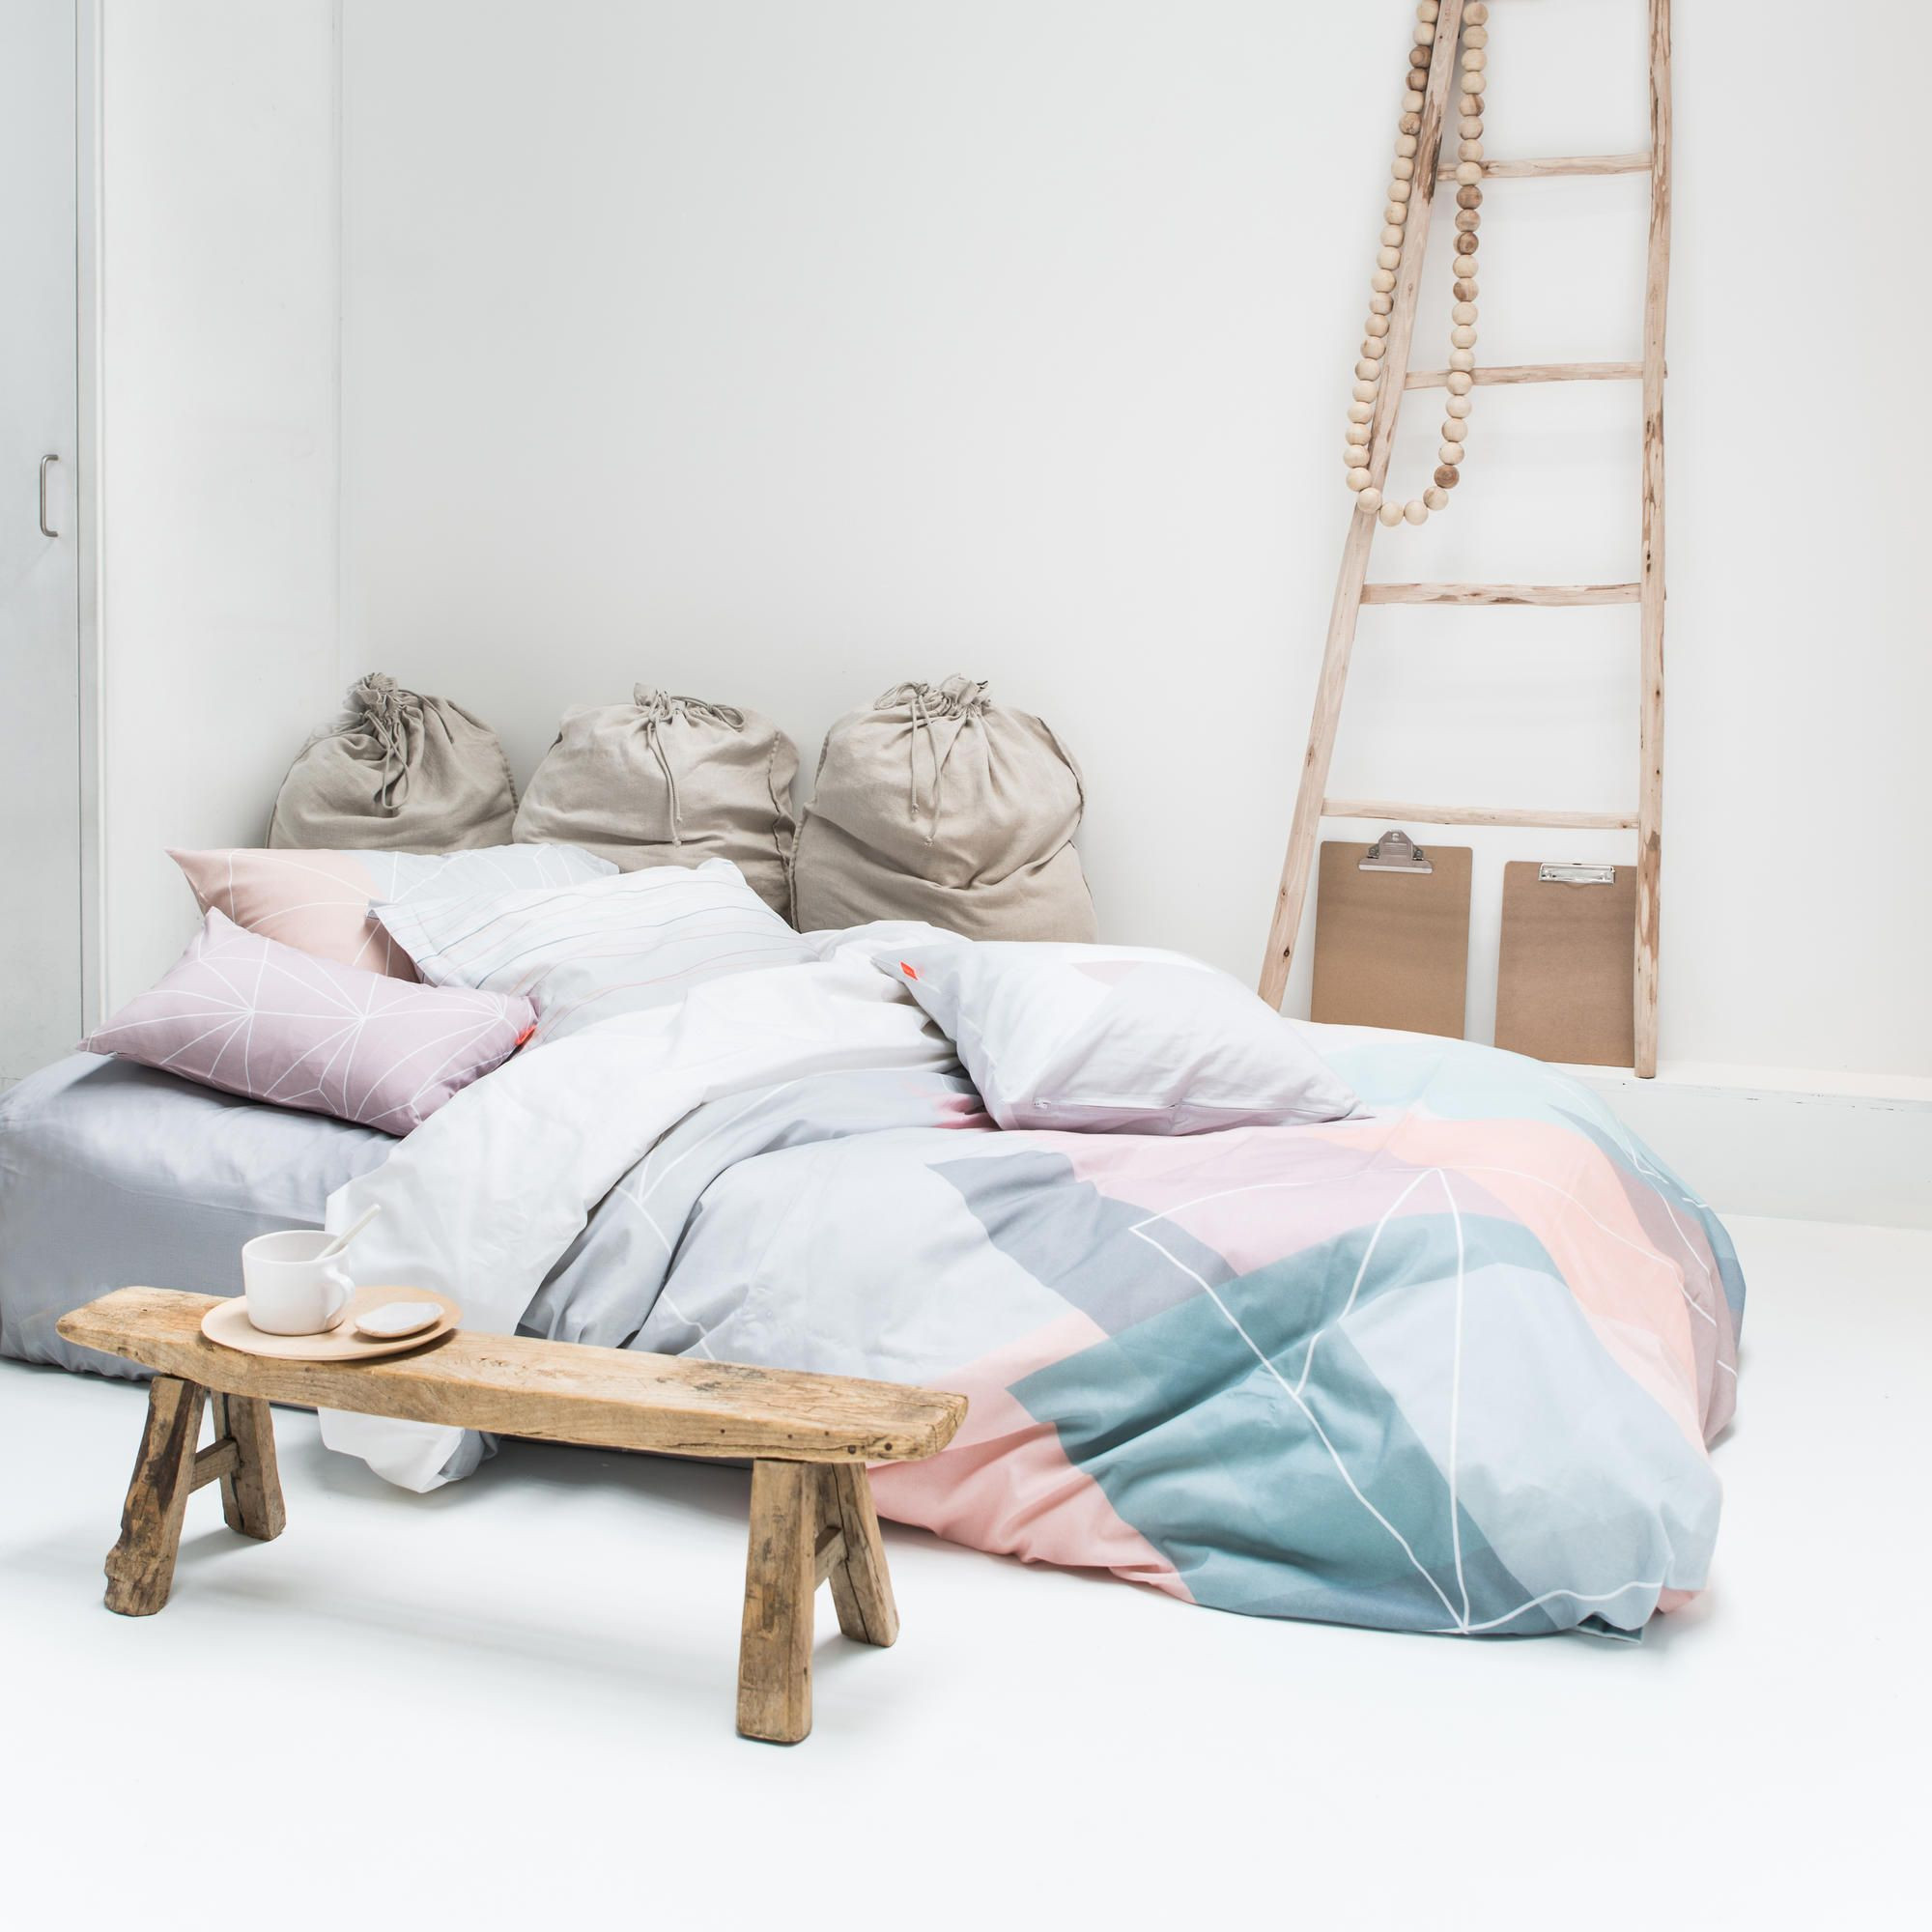 Bettbezug | Bereich-140 x 200 cm